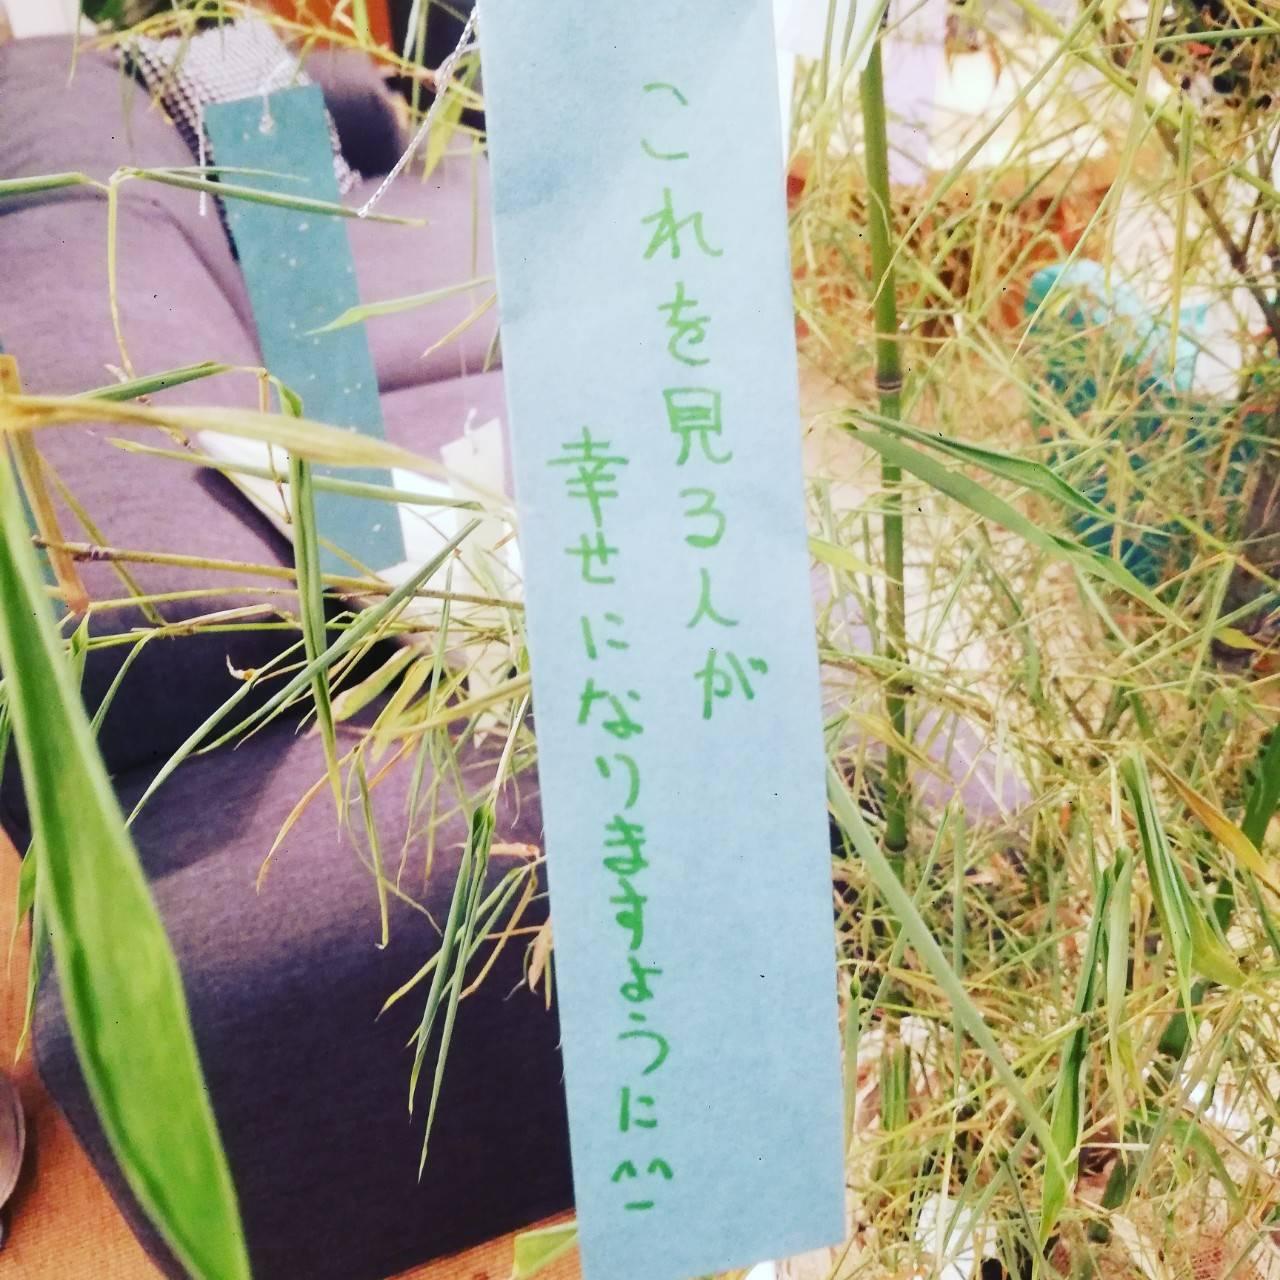 【〜tryしてみる〜人生史上サイコーの毎日を更新するための言葉vol.19】